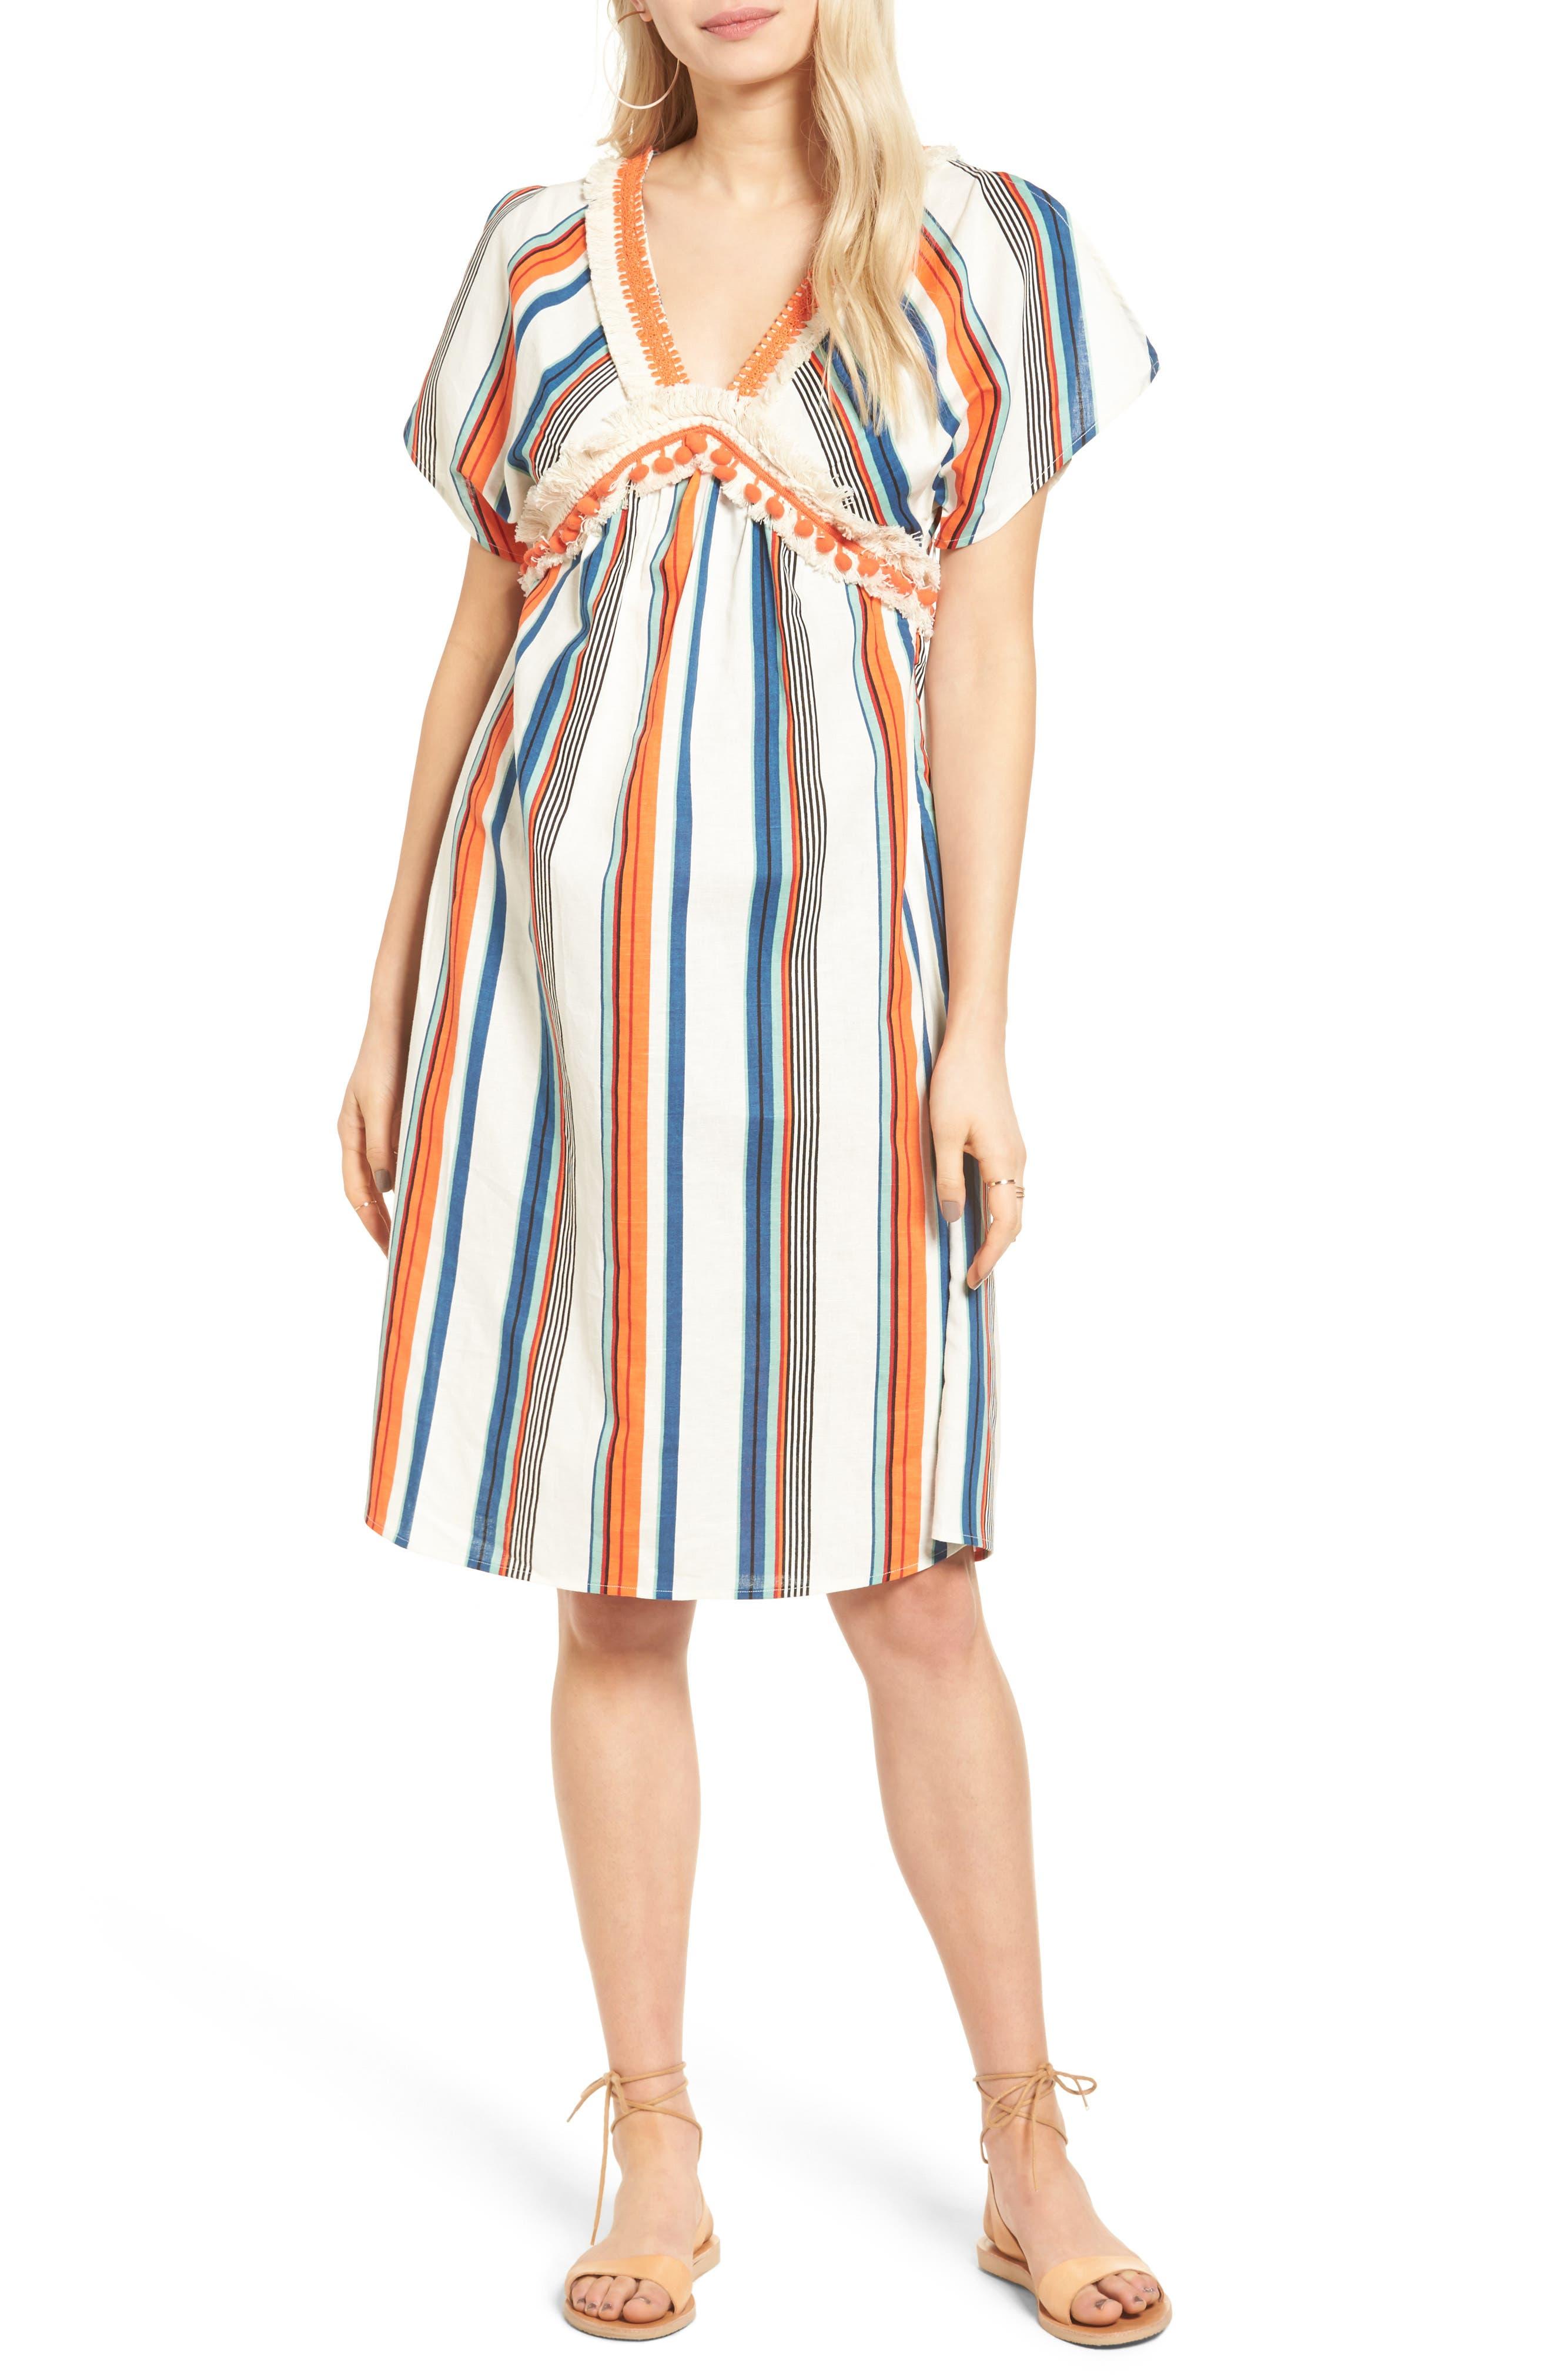 Alternate Image 1 Selected - MOON RIVER Stripe Linen & Cotton Dress